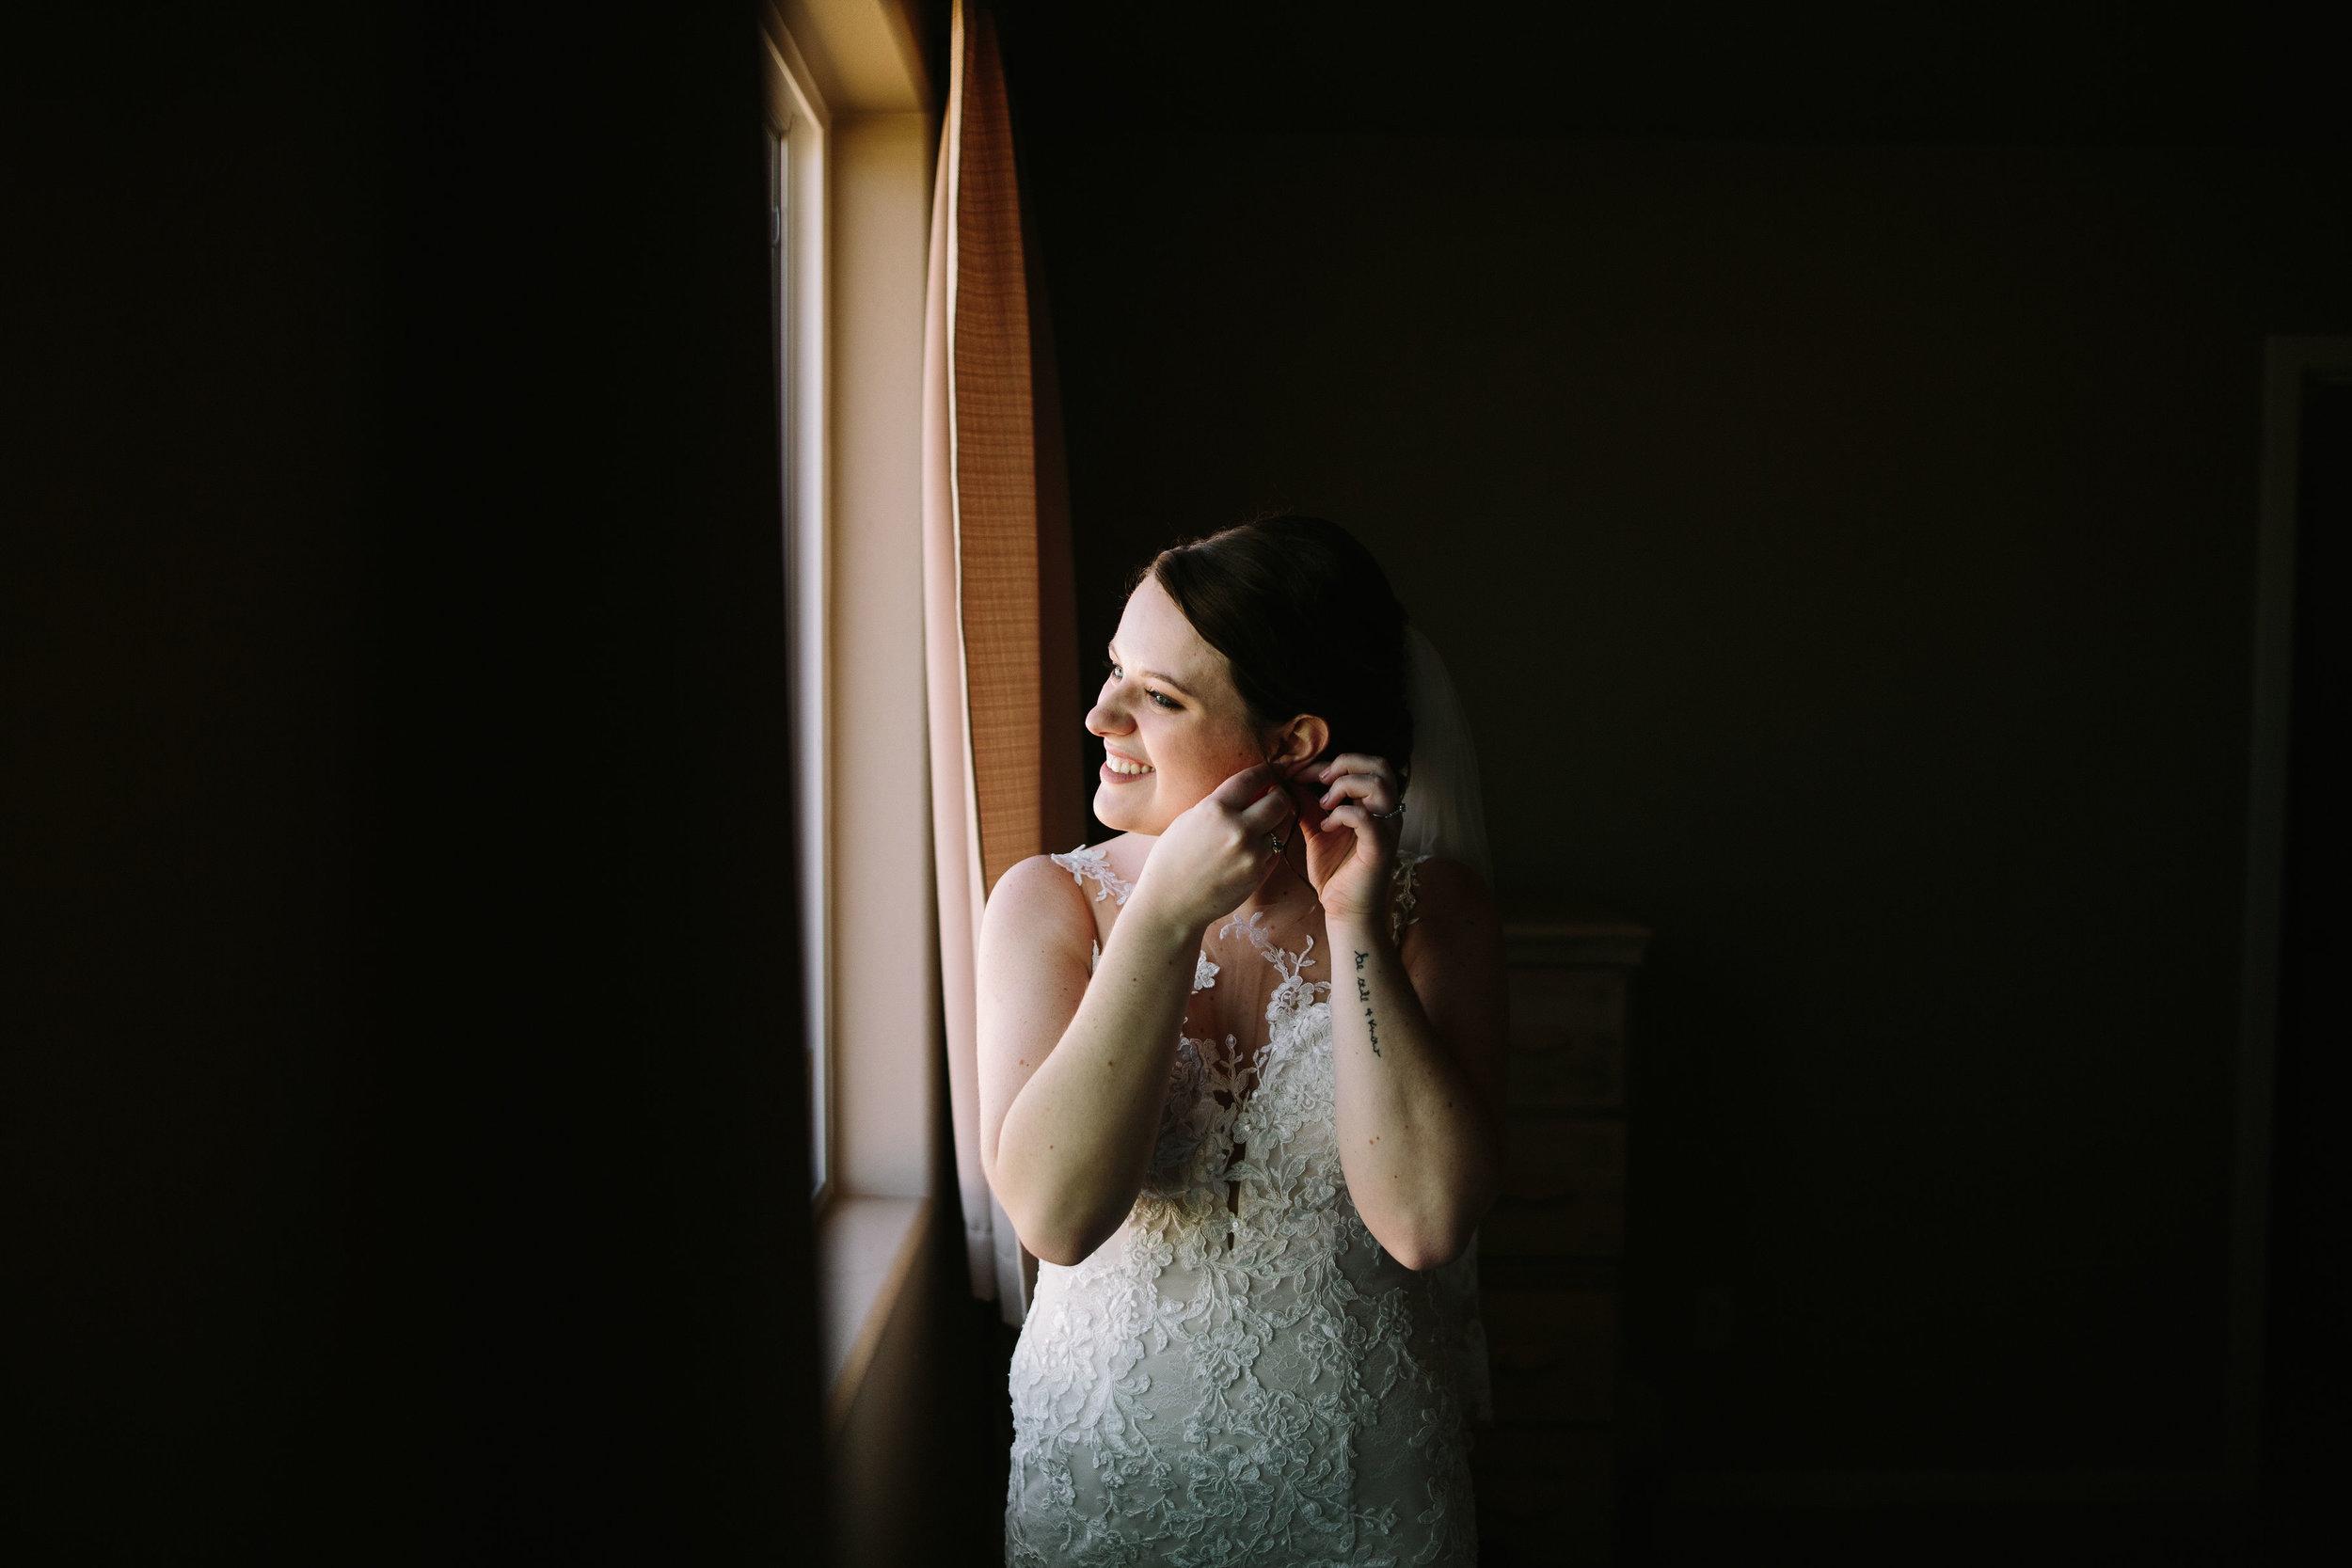 Fun Rustic spokane wedding getting ready earrings smile looking out window